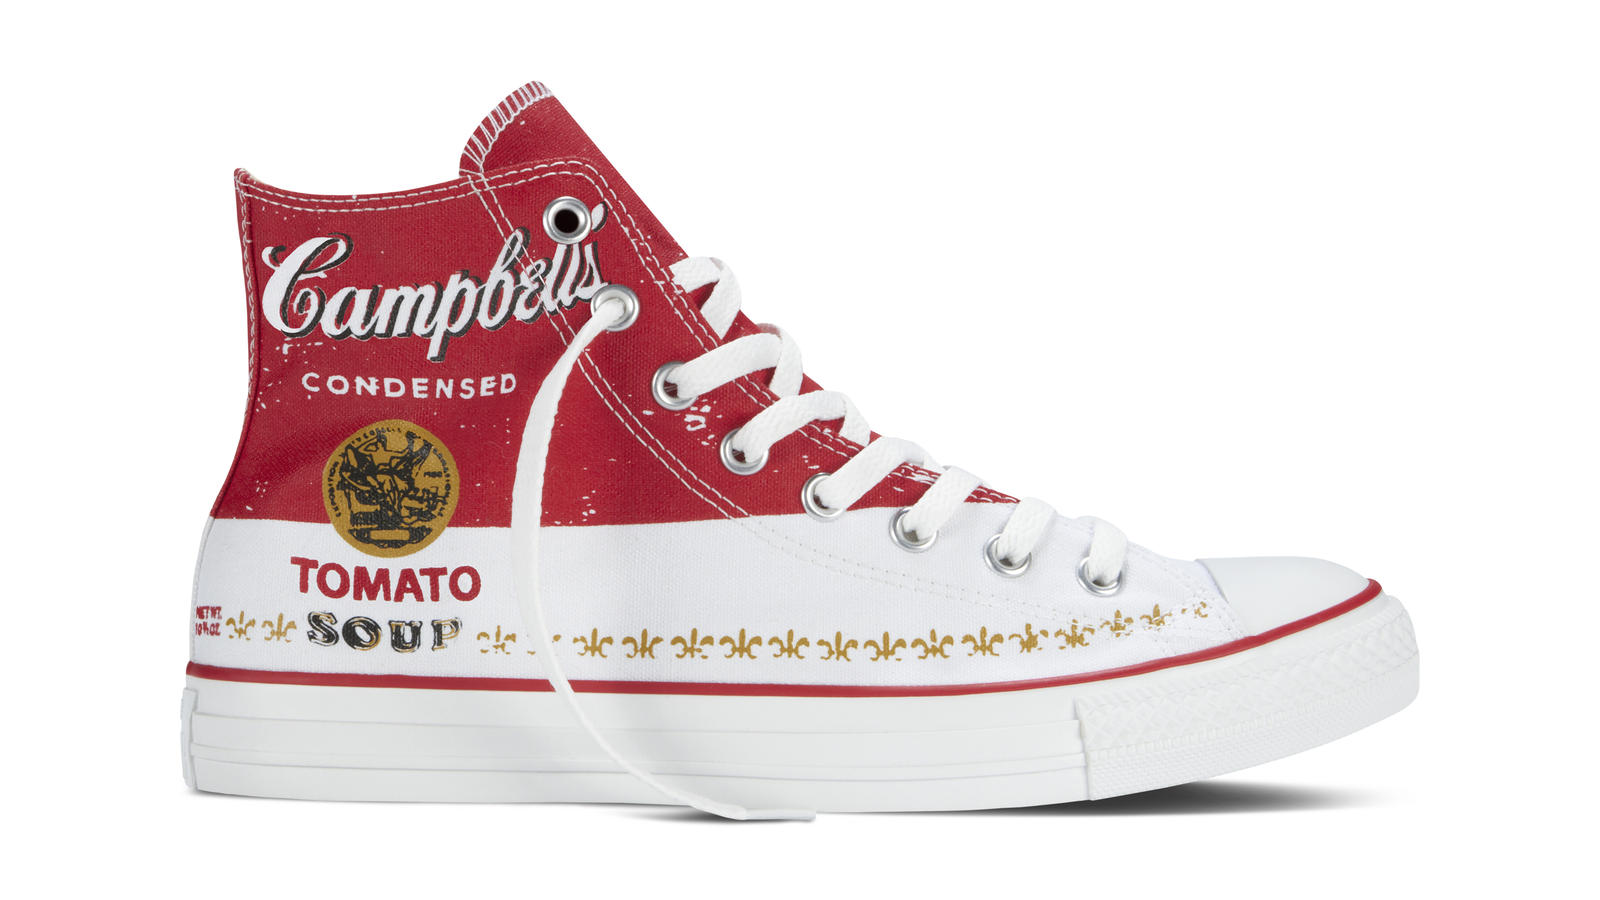 ab52d63498e3 Converse Celebrates the Creative Spirit of Andy Warhol - Nike News